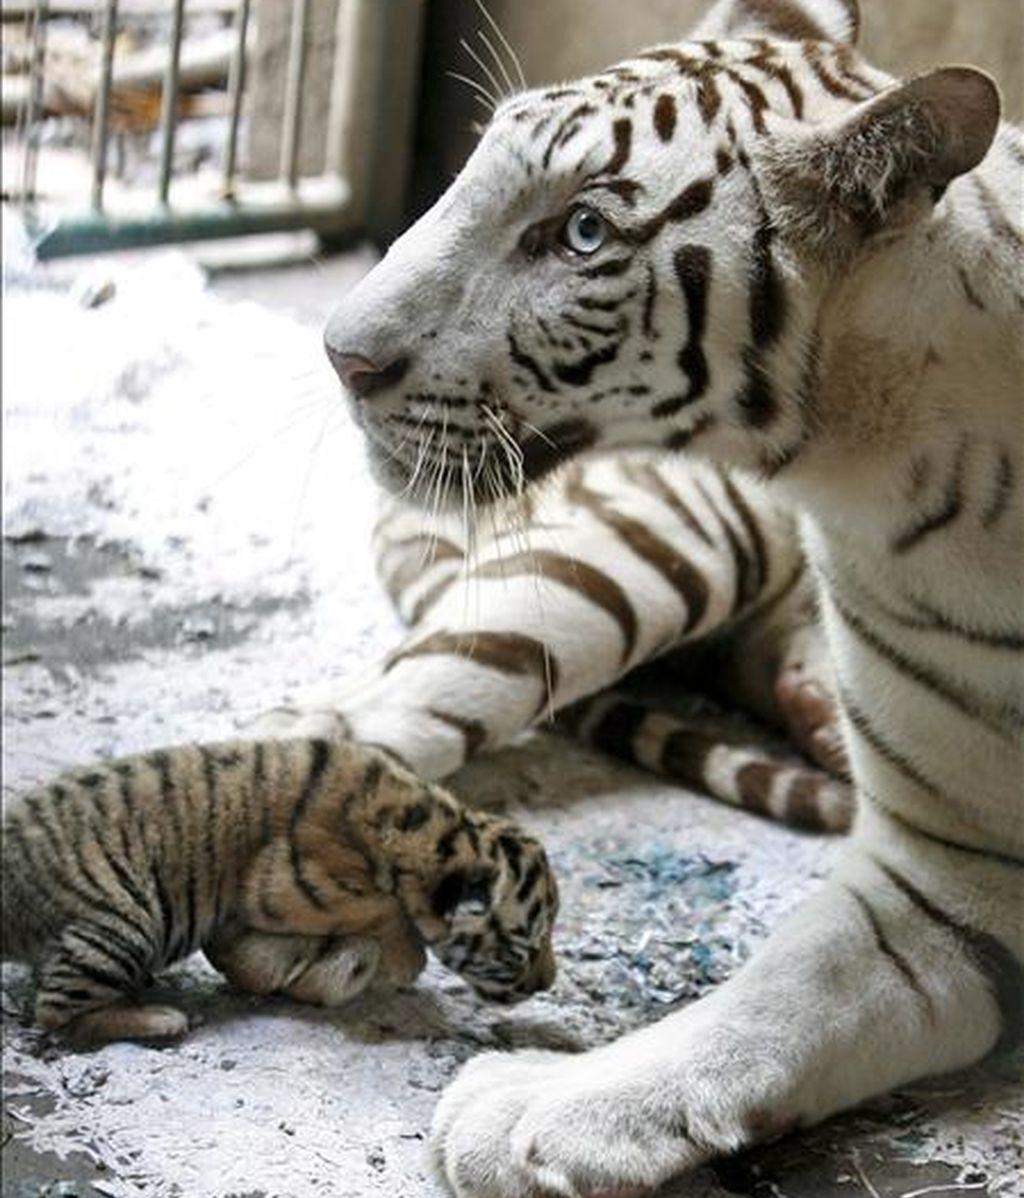 Una tigresa de Bengala reposa junto a su cachorro. EFE/Archivo